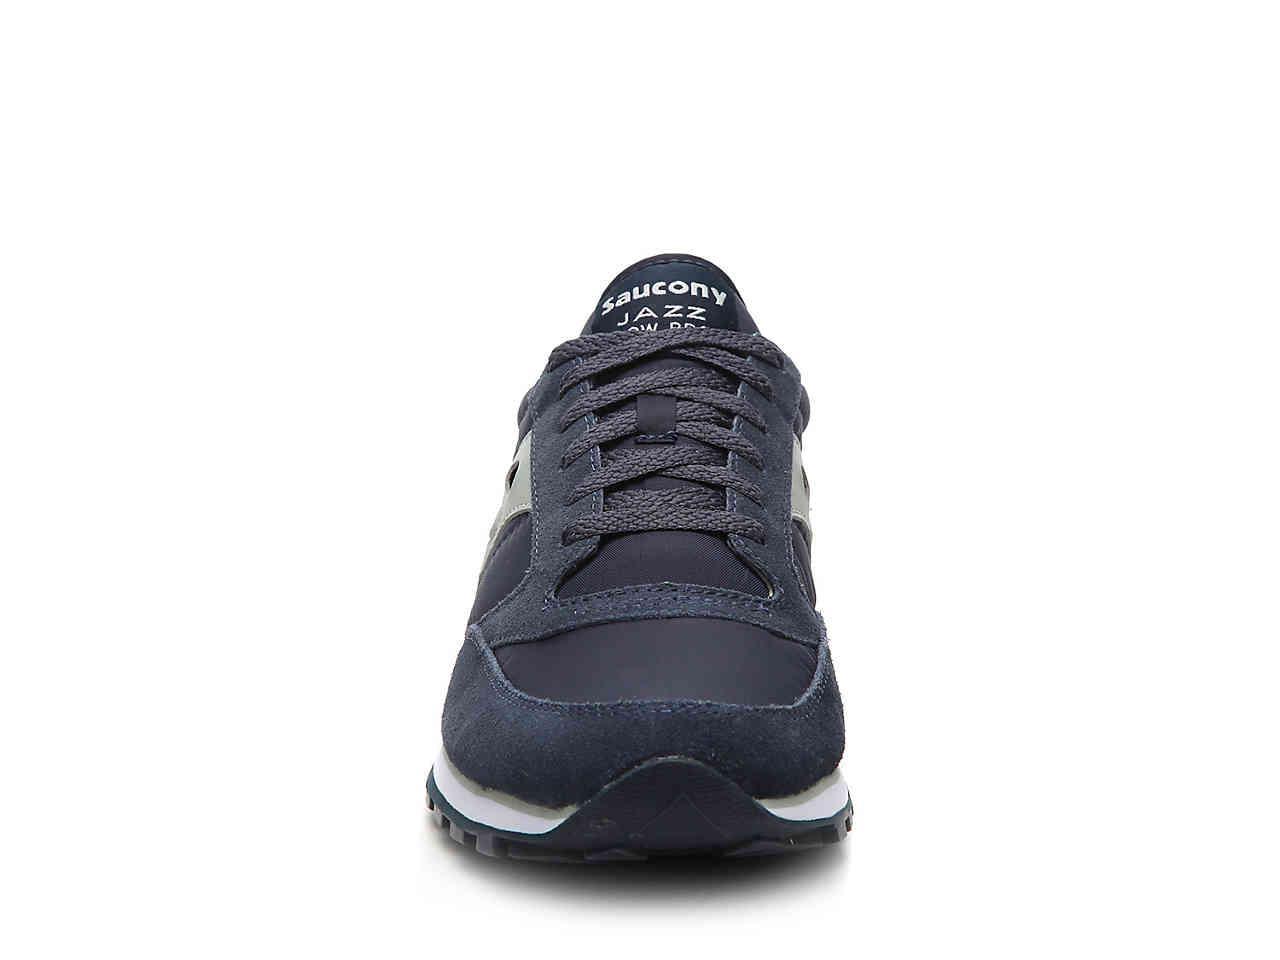 7ff1906c63 Lyst - Saucony Jazz Low Pro Retro Sneaker in Blue for Men